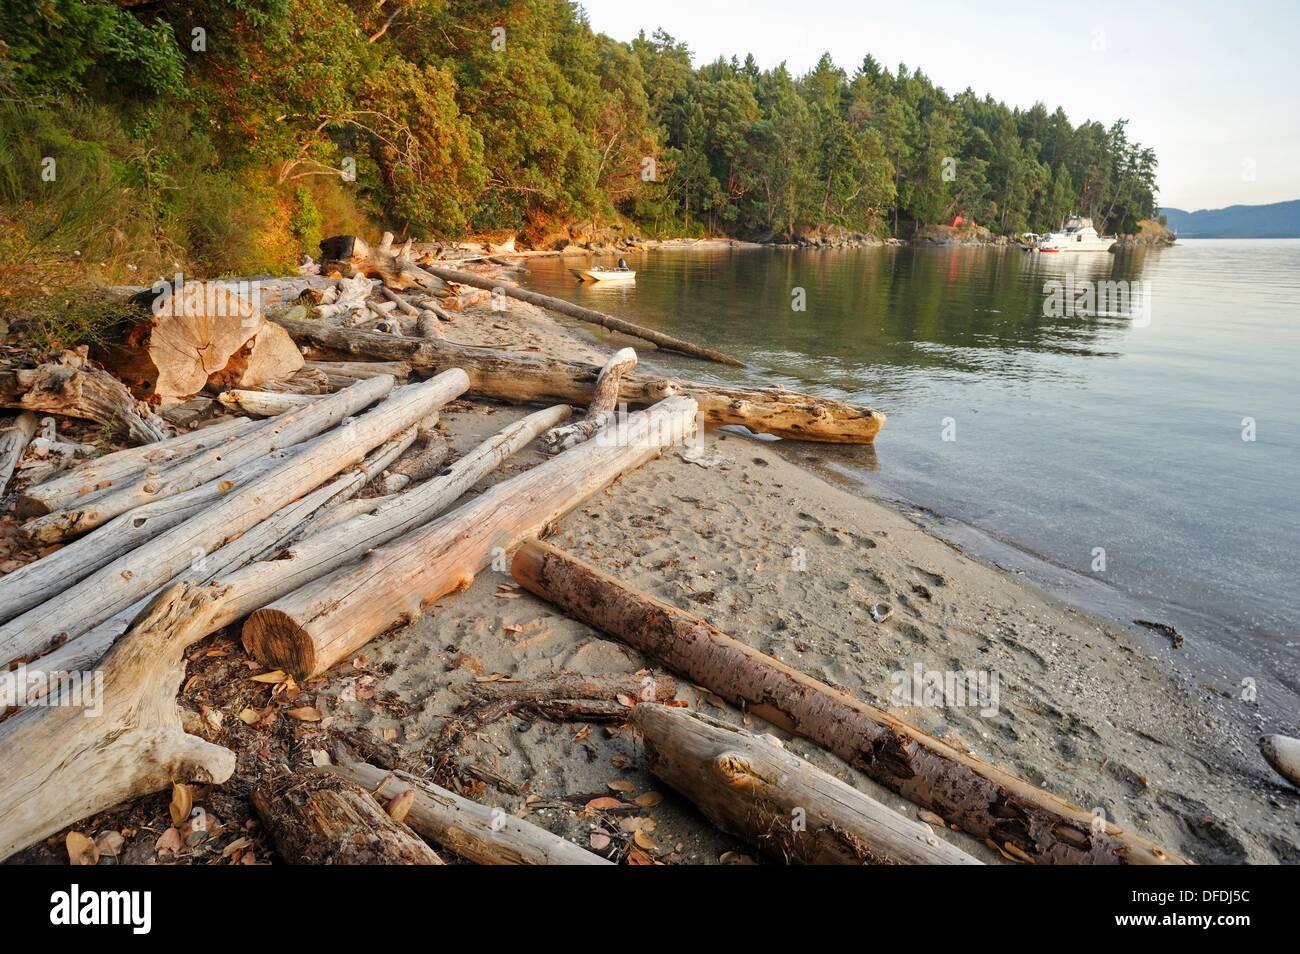 logs on beach Tent Island Gulf Islands British Columbia Canada & logs on beach Tent Island Gulf Islands British Columbia Canada ...